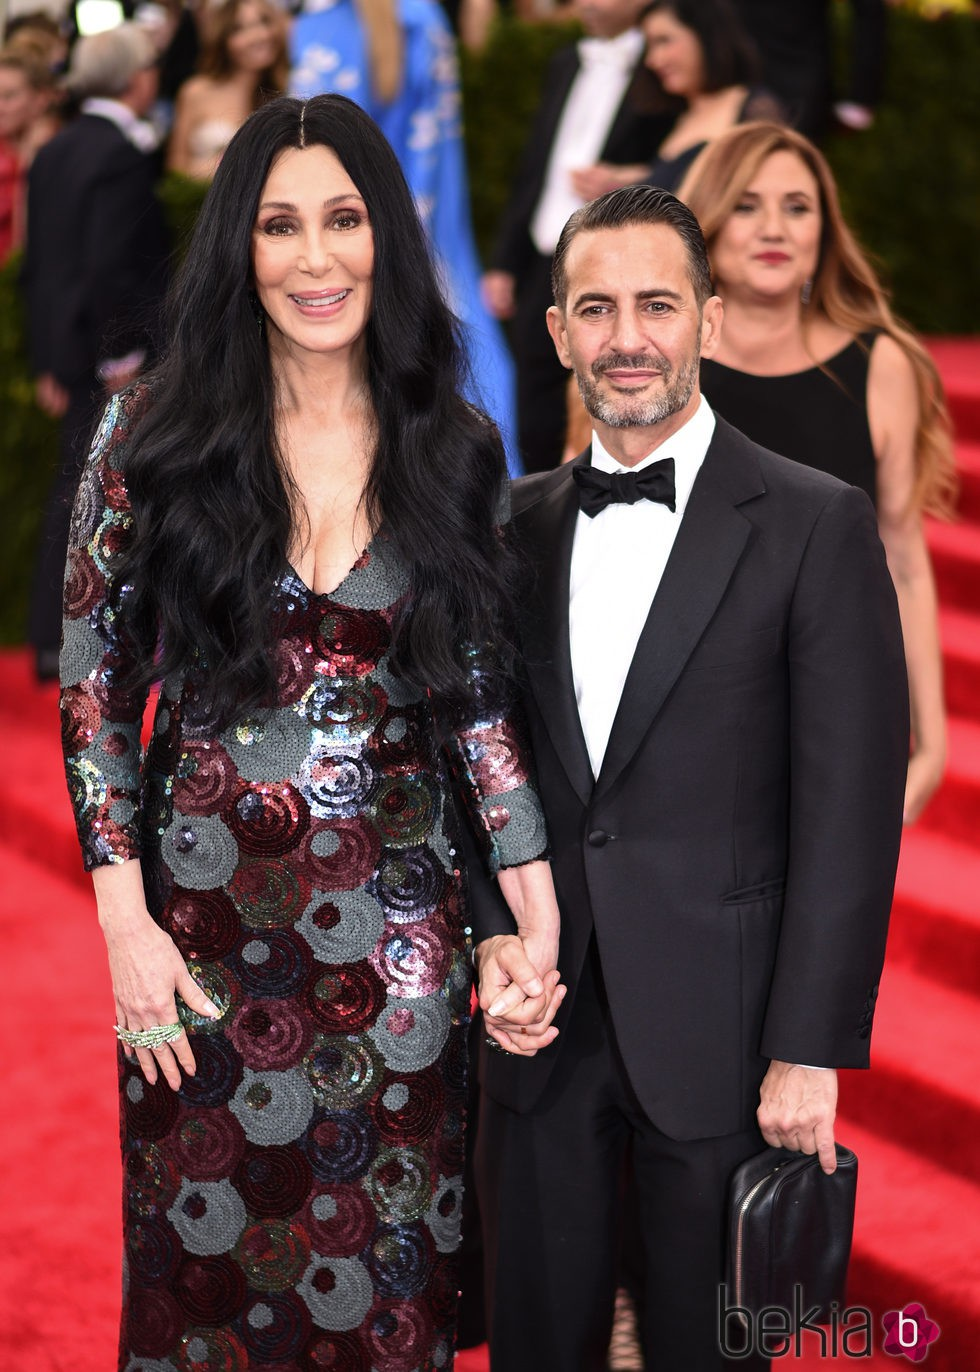 Cher y Marc Jacobs en la Gala del Met 2015